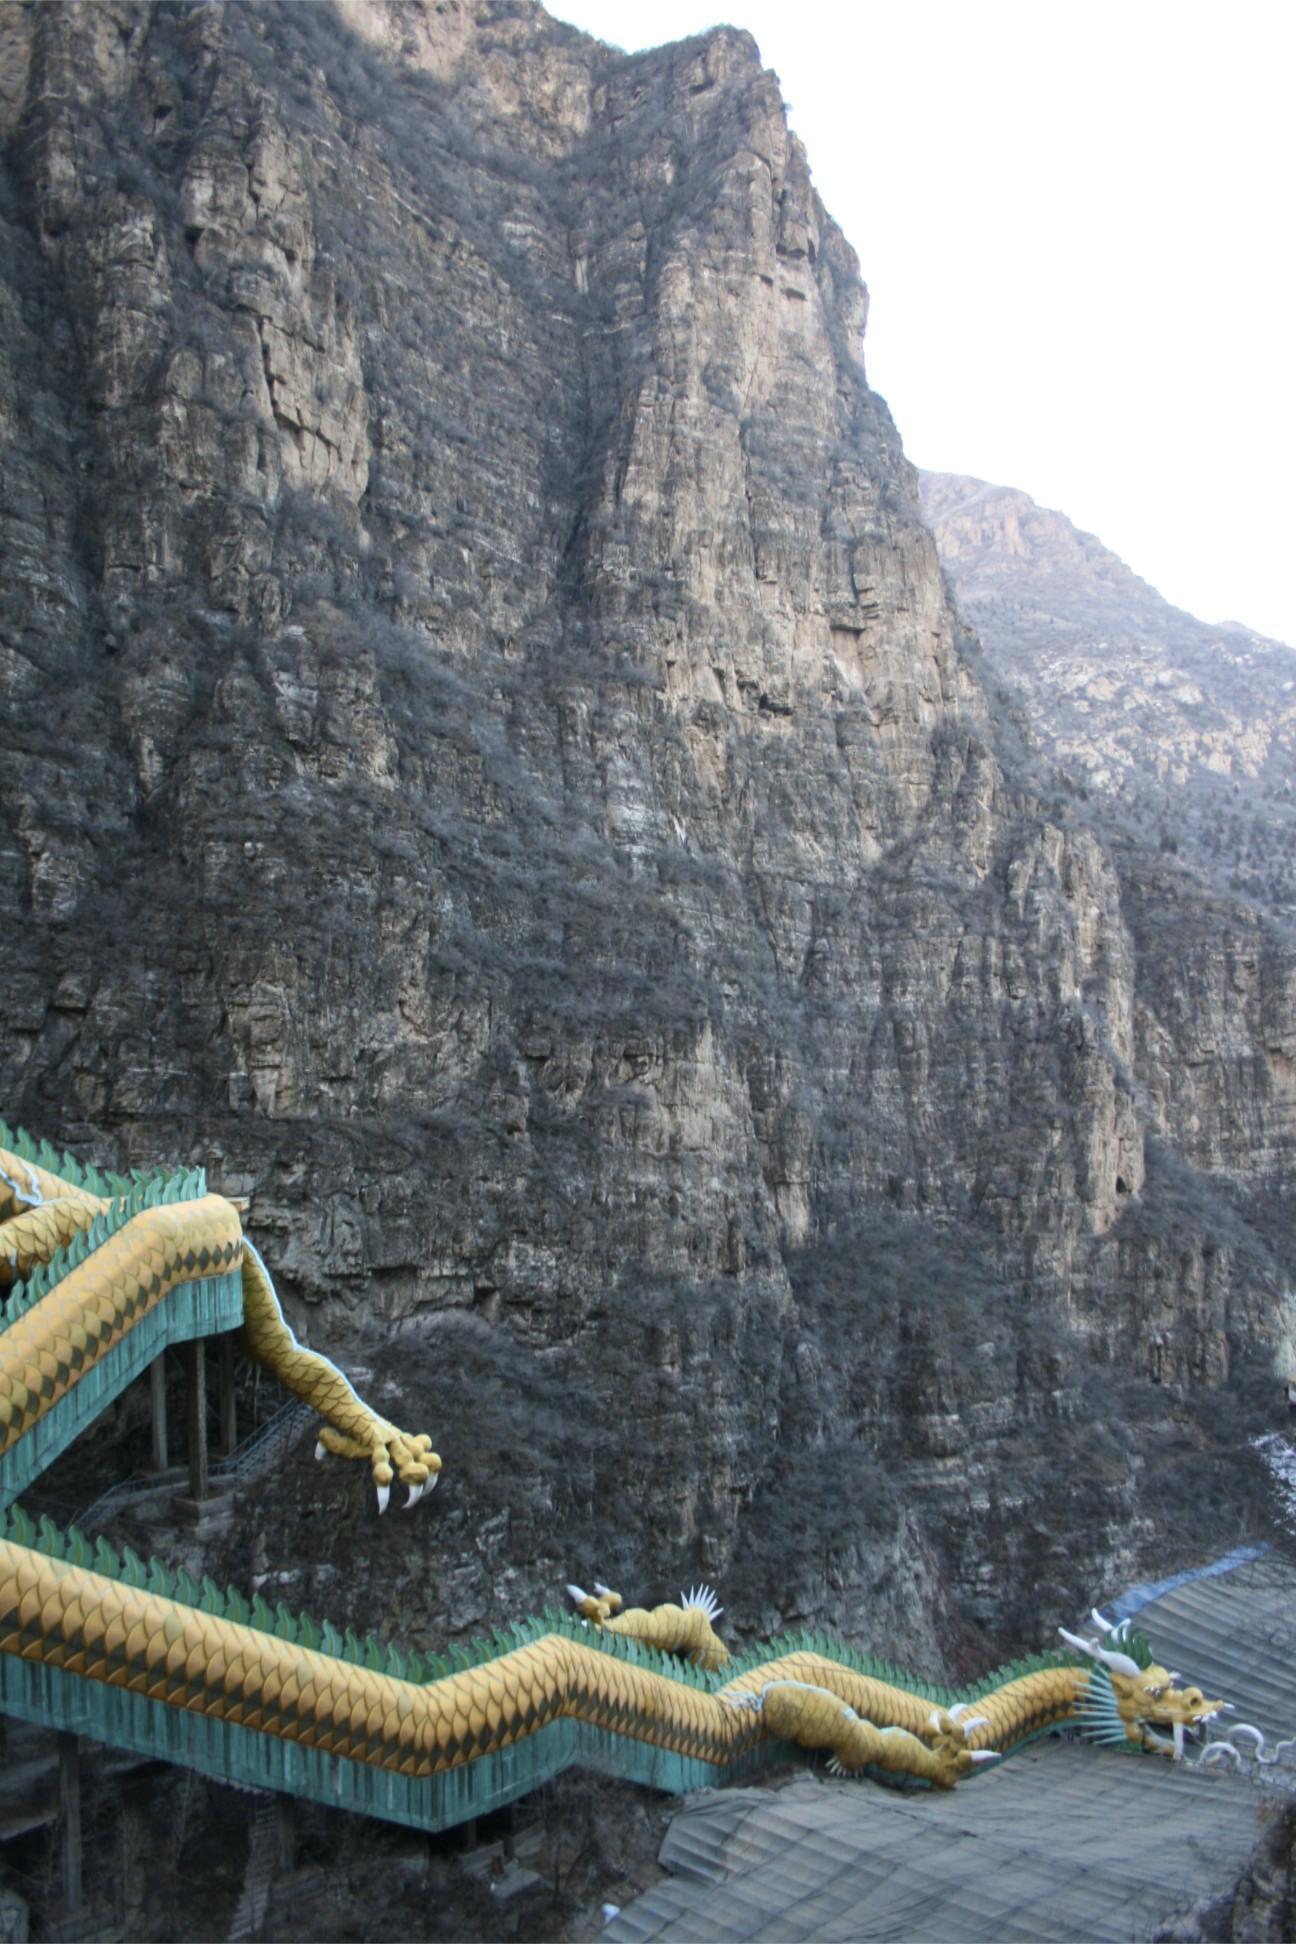 Dragon escalator